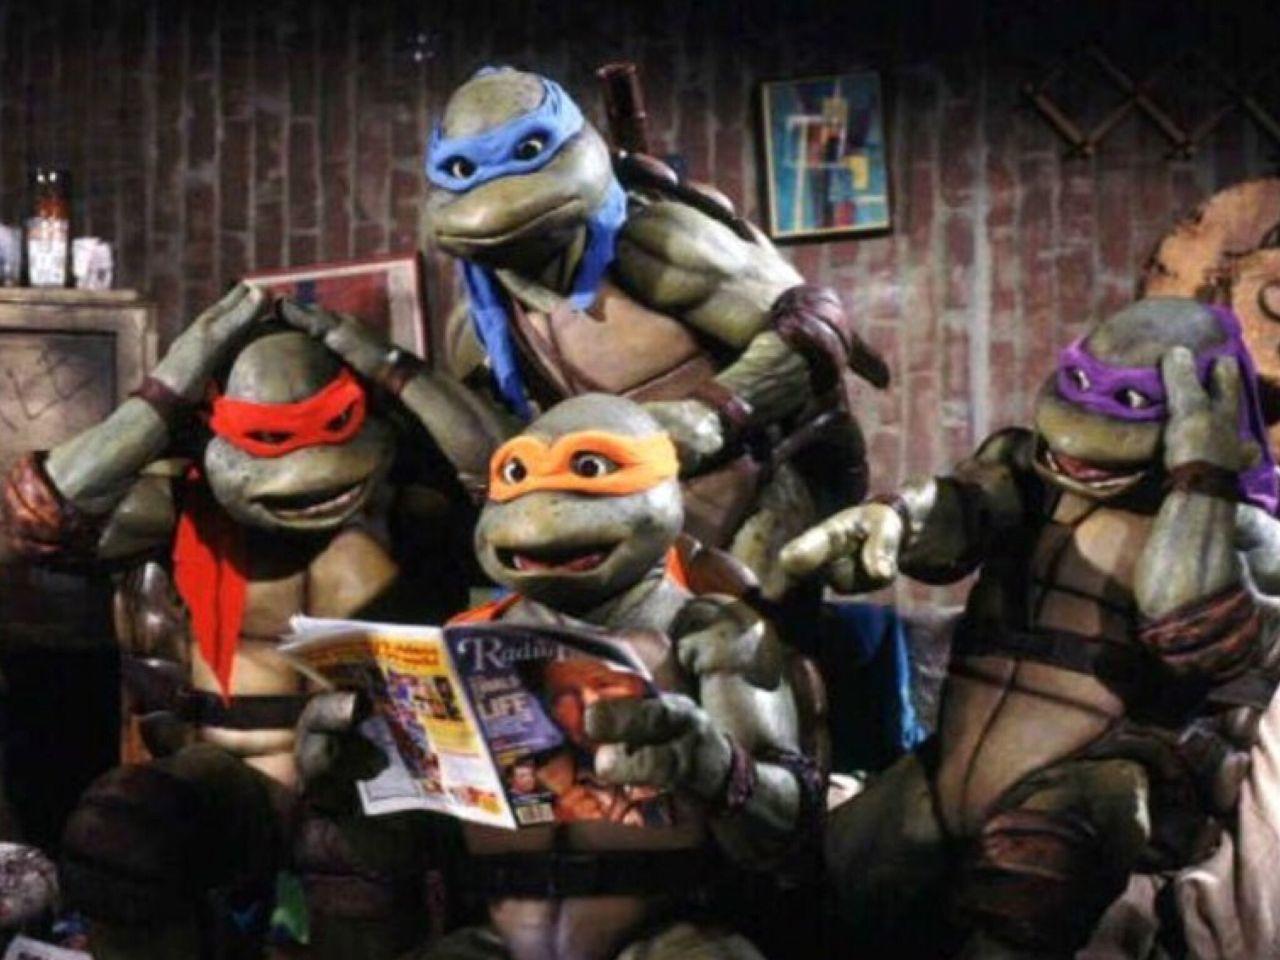 HBO Max to Add the Three Original 'Teenage Mutant Ninja Turtles' Movies on Thursday, October 1, 2020